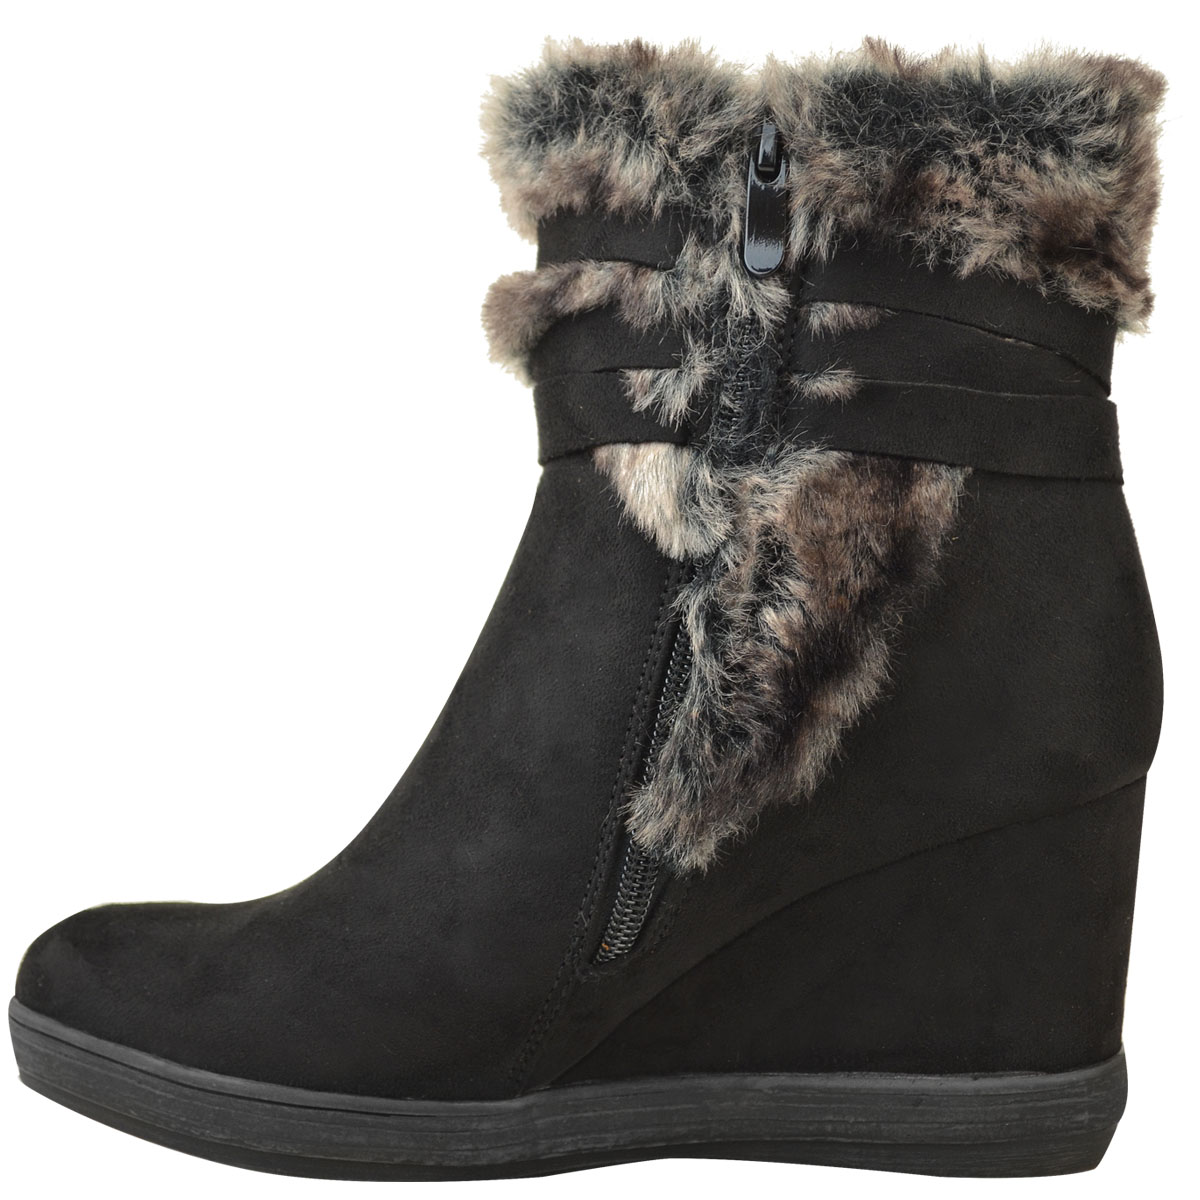 Womens-Ladies-Wedge-Low-Heel-Winter-Knee-Boots-Warm-Faux-Fur-Fleece-Size-UK thumbnail 22